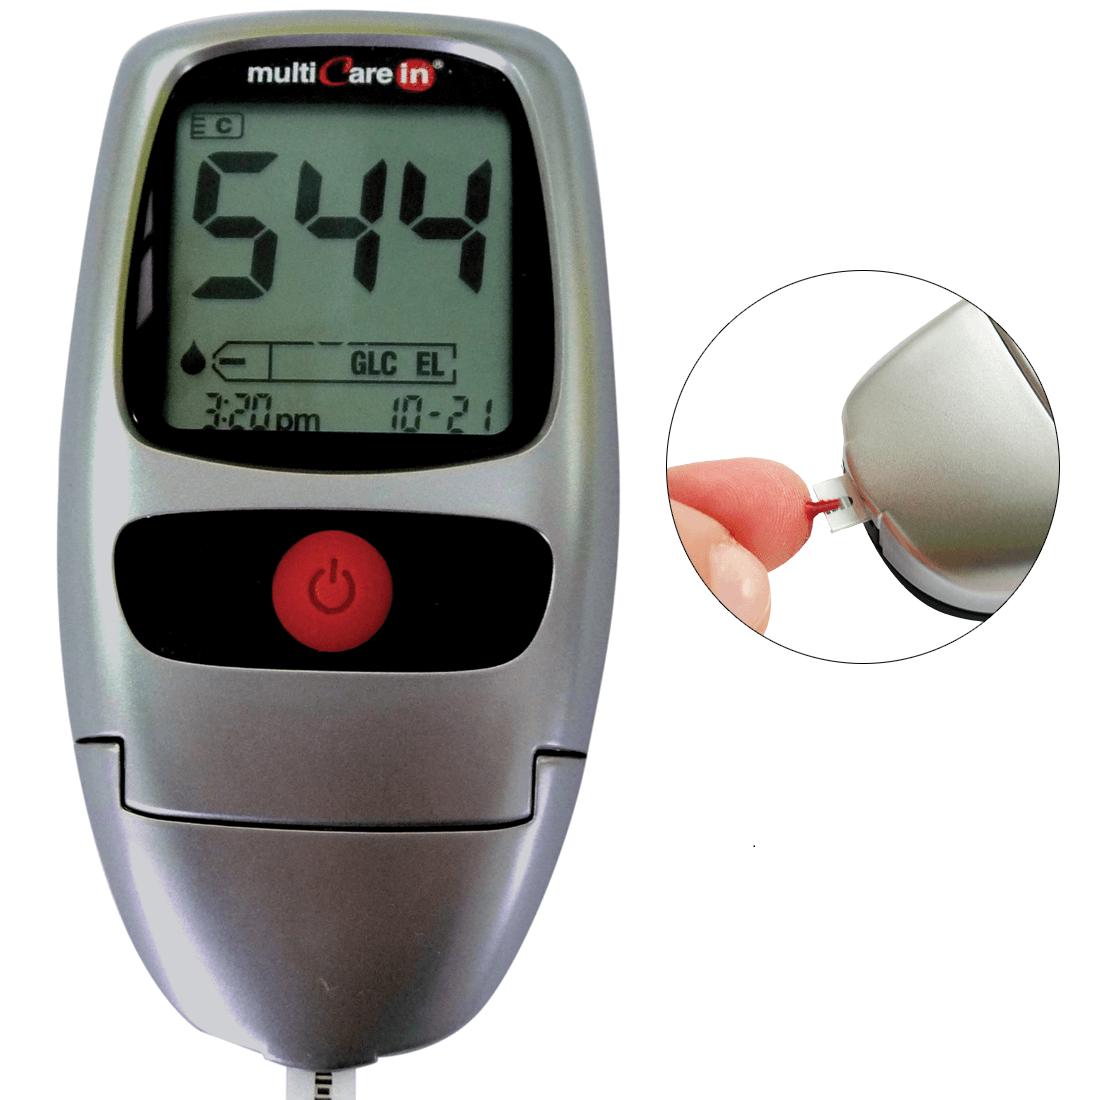 MultiCare In Cholesterol-Triglycerides-Glucose Meter | Strip Ejector | Male/Female